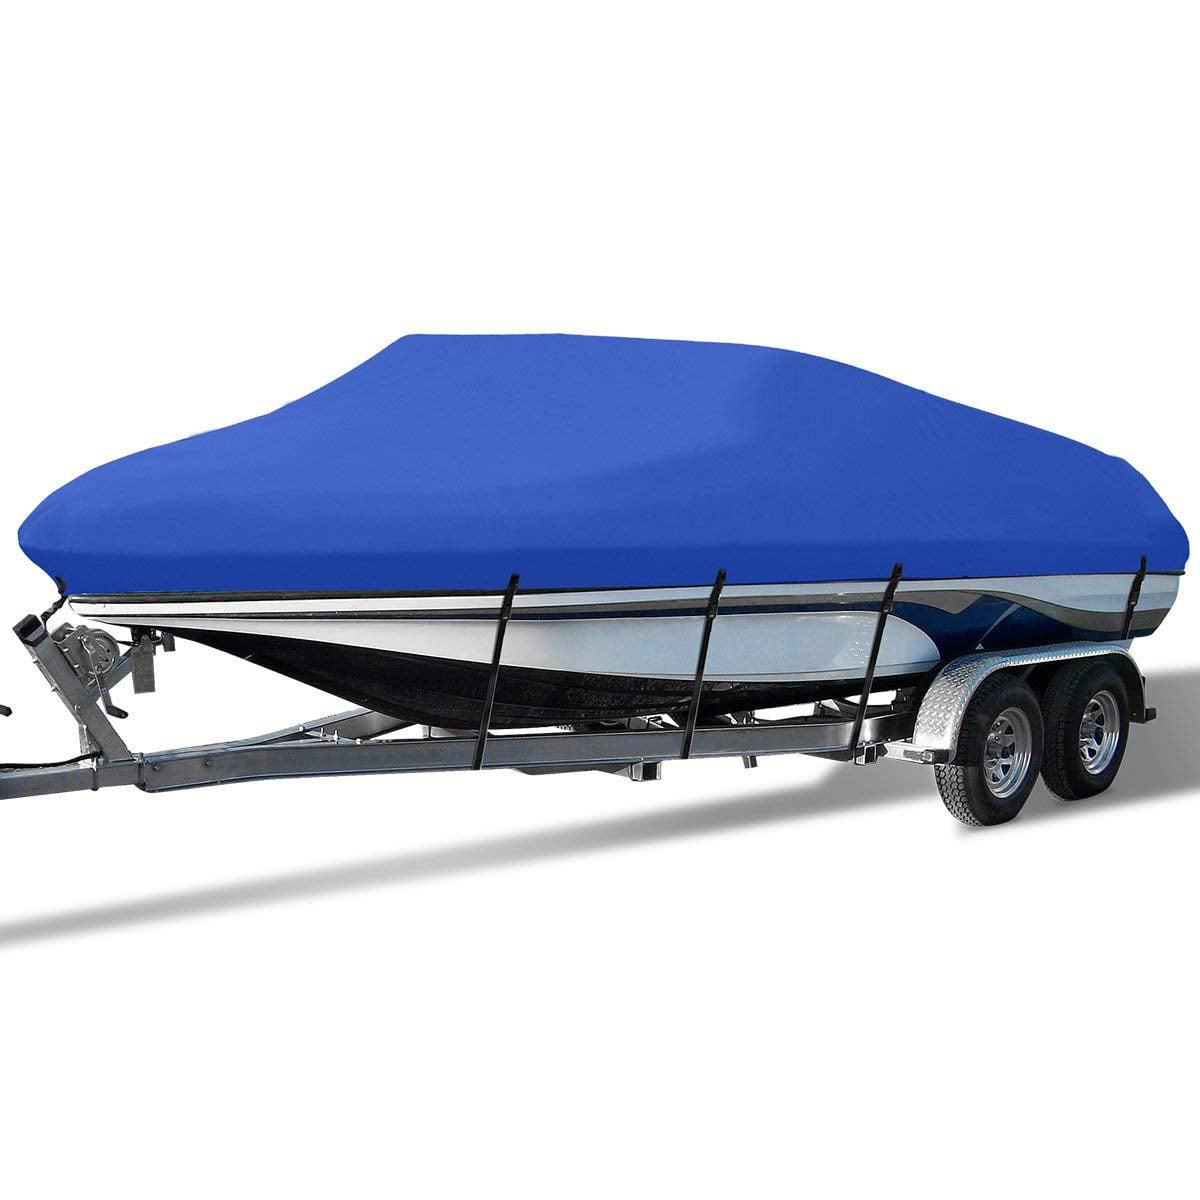 Blue 17/' 18/' 19/' V-Hull Fish Ski Trailerable Boat Cover Oxford fabric